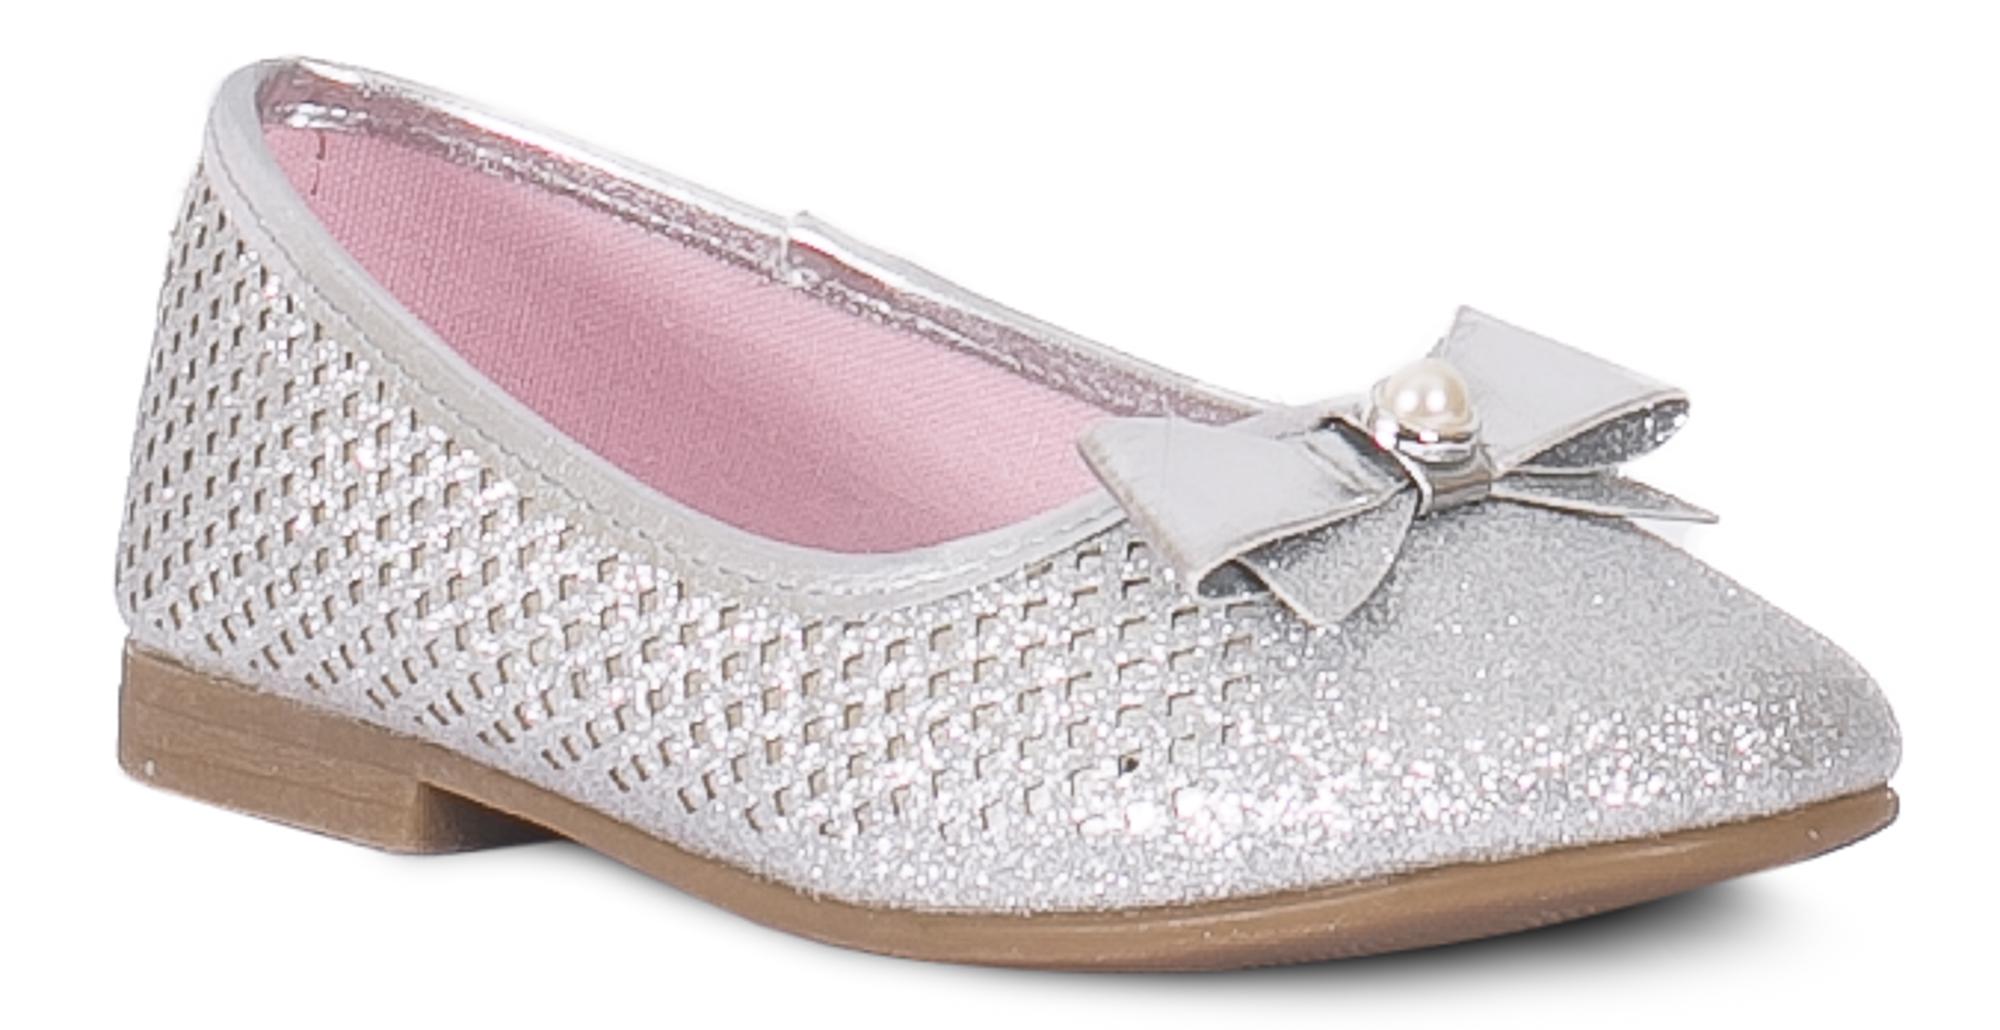 Туфли для девочки Barkito 446359 туфли barkito туфли для девочки